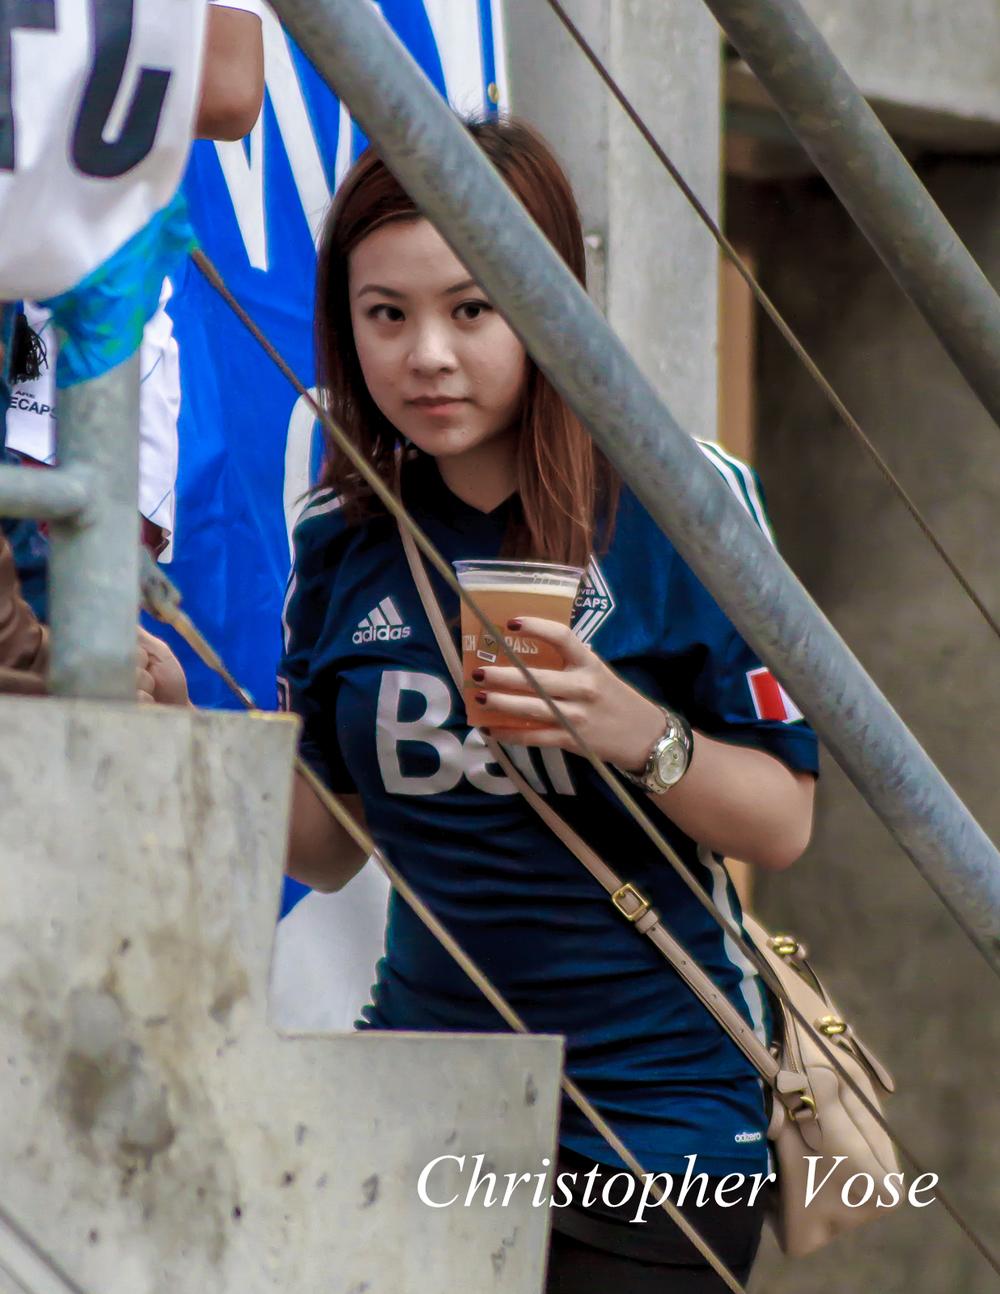 2014-10-10 Vancouver Whitecaps FC Supporter.jpg